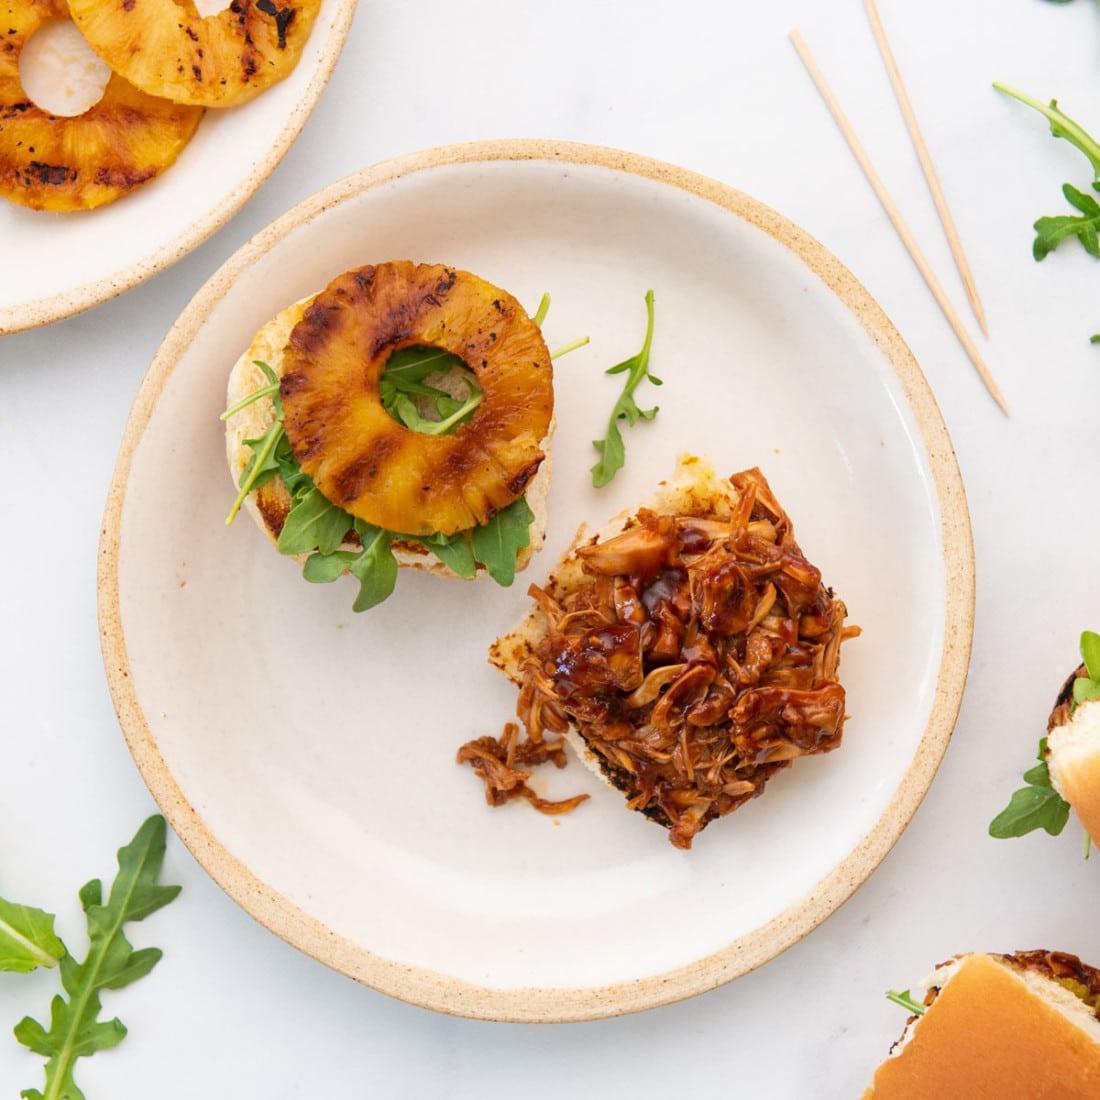 Pineapple Teriyaki Jackfruit Sliders open face on a plate